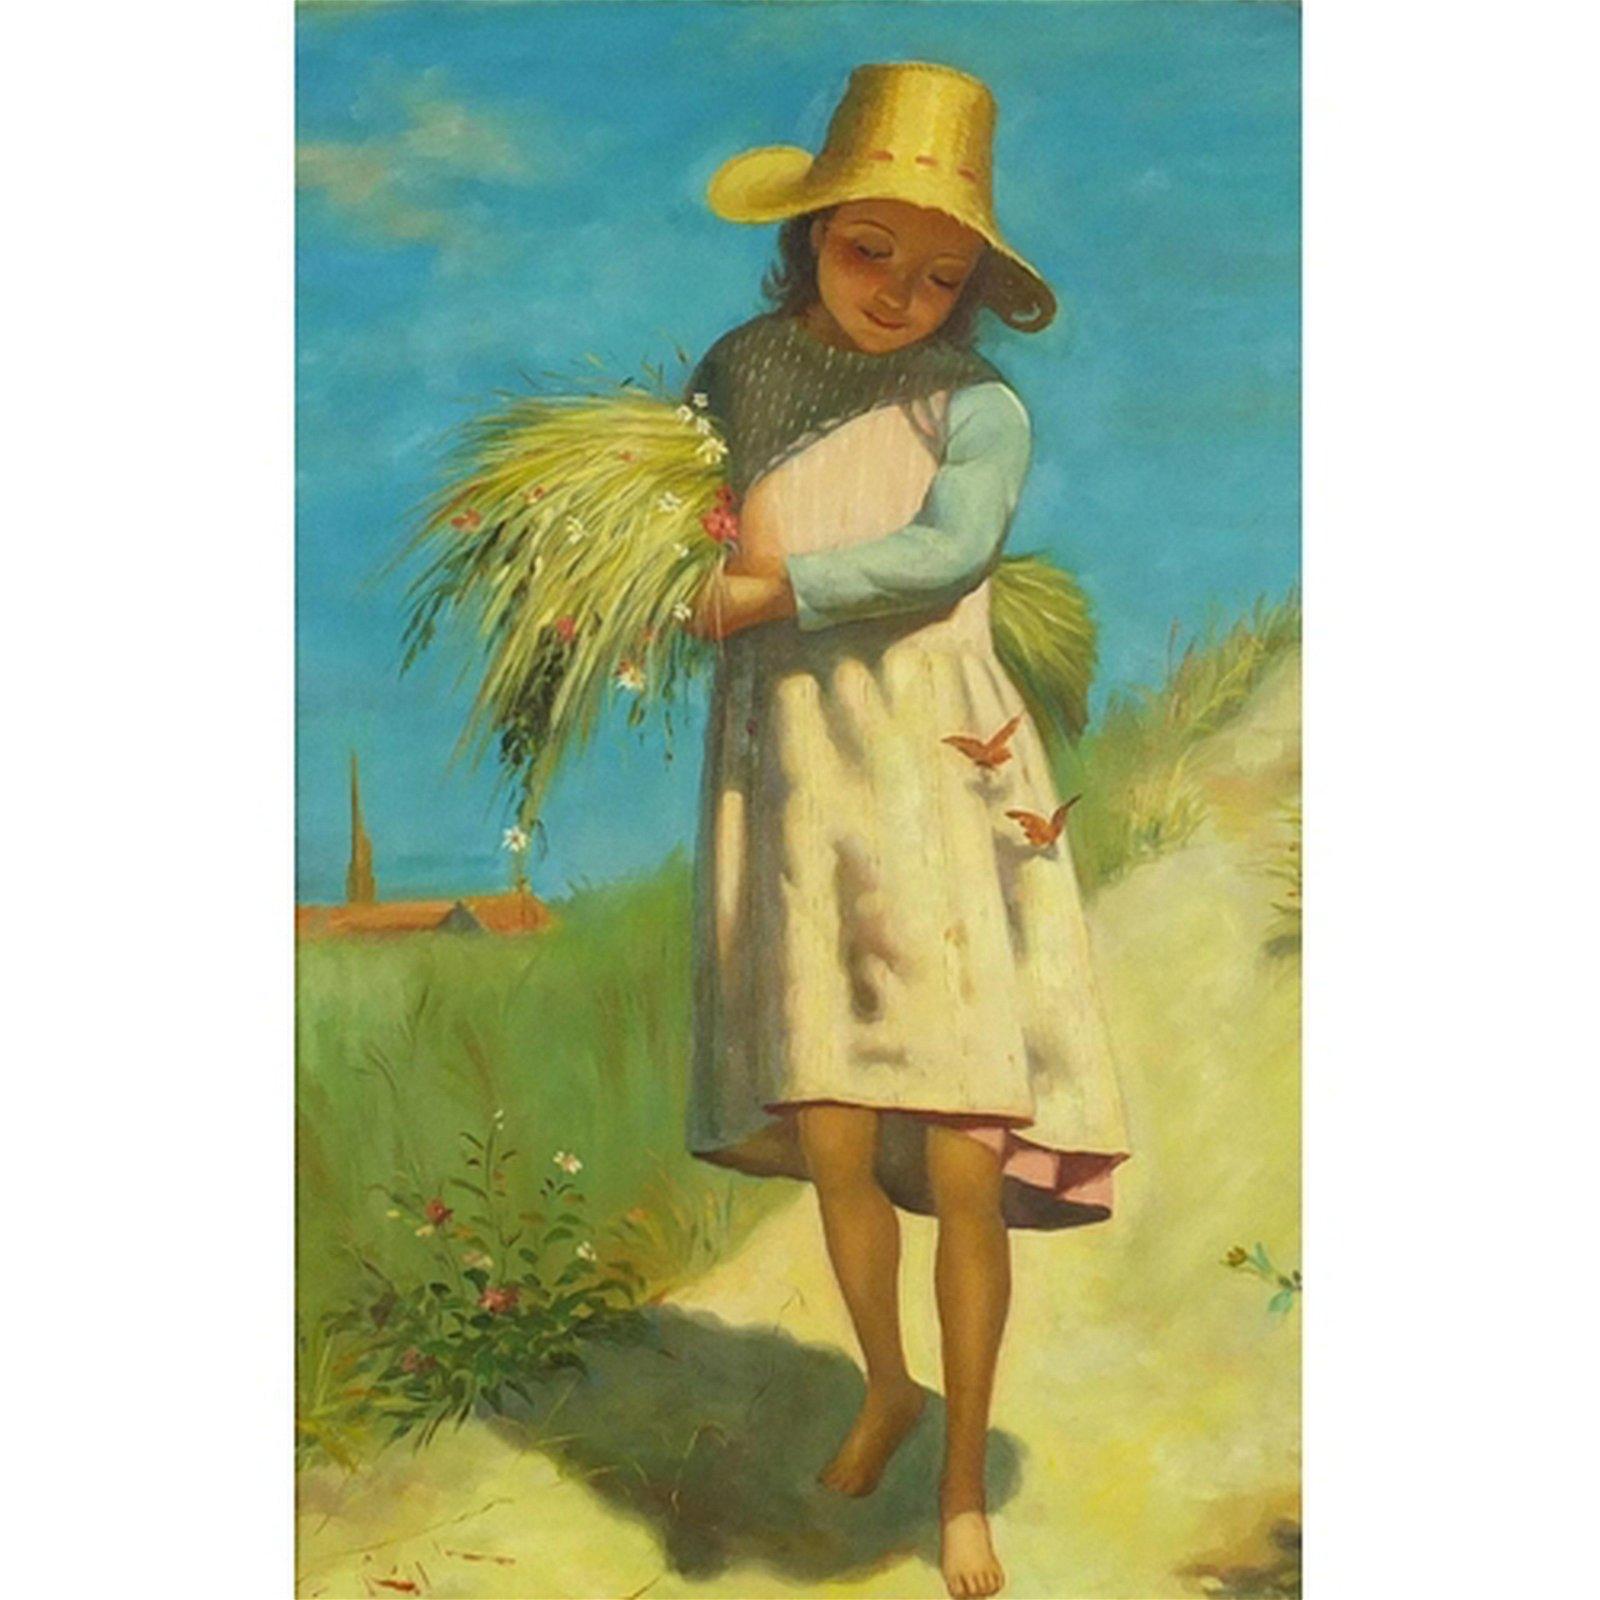 Young girl holding wheat, Italian school oil on board,